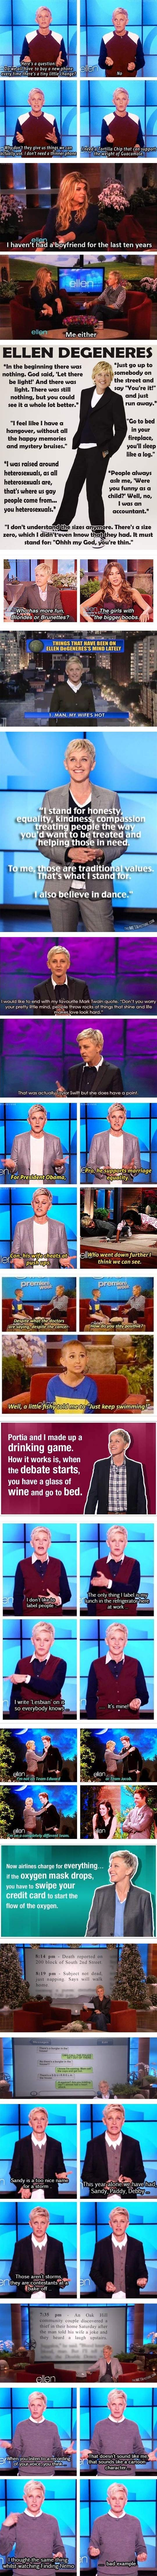 Ellen-isms. DYING lol